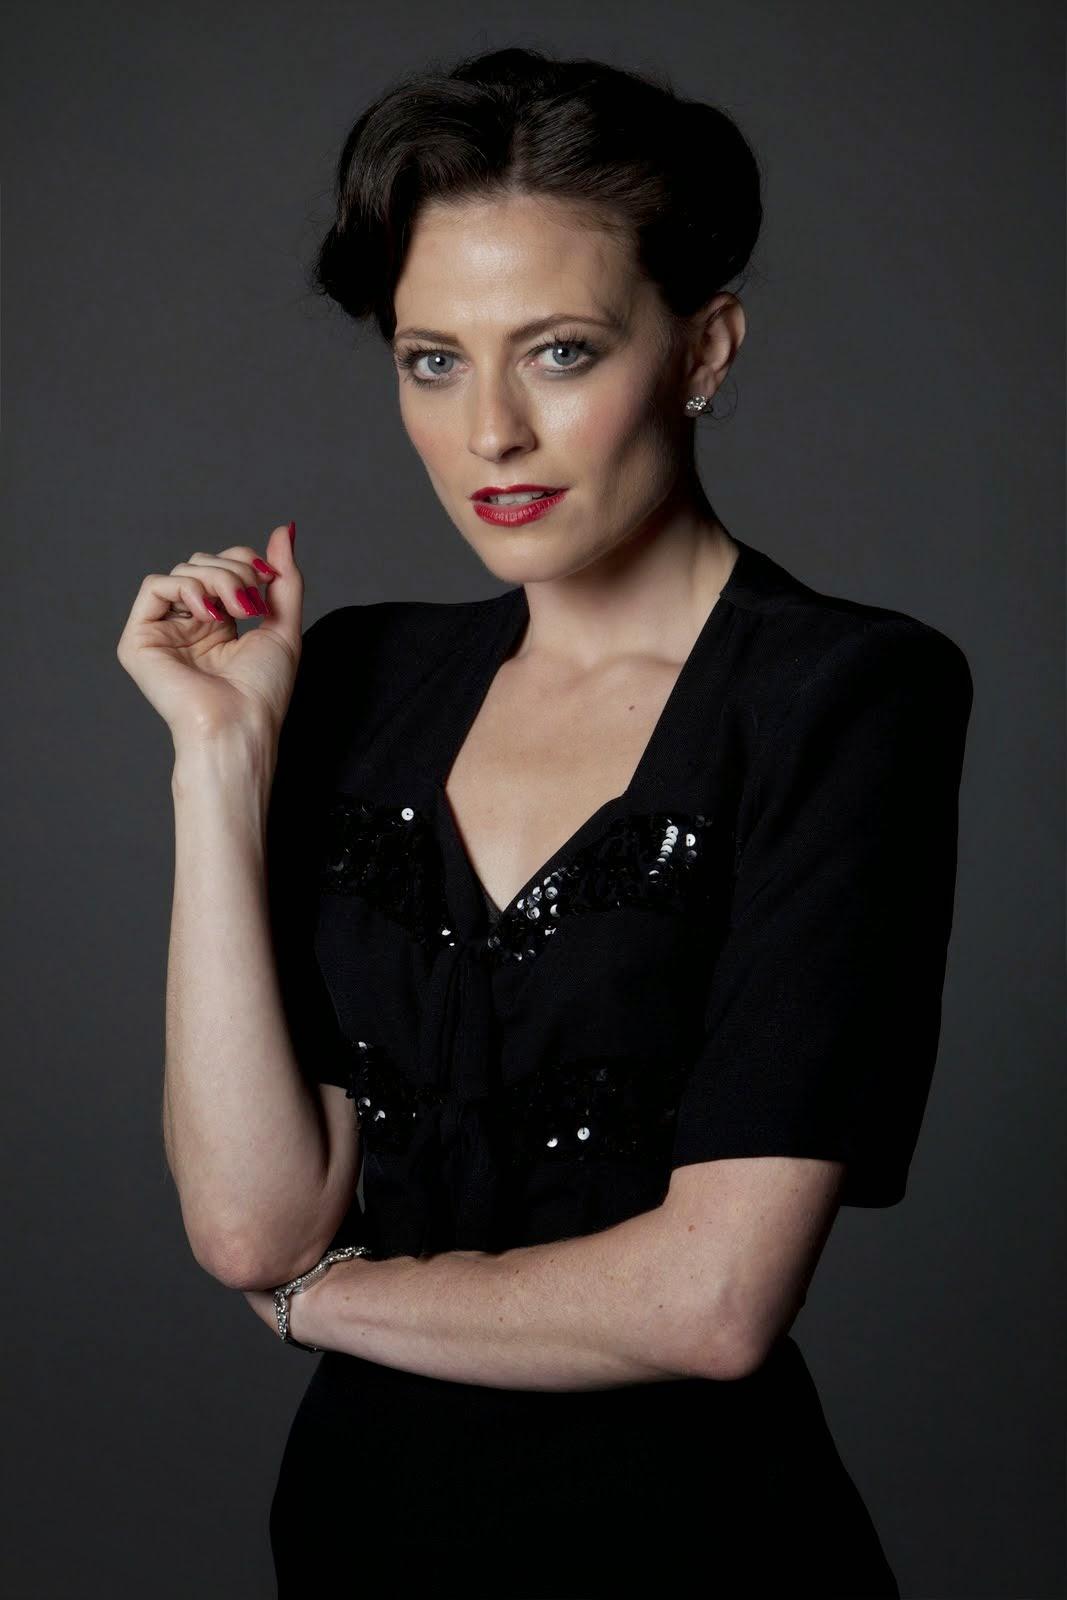 Lara Pulver as Irene Adler in BBC Sherlock Season 2 Episode 1 A Scandal in Belgravia